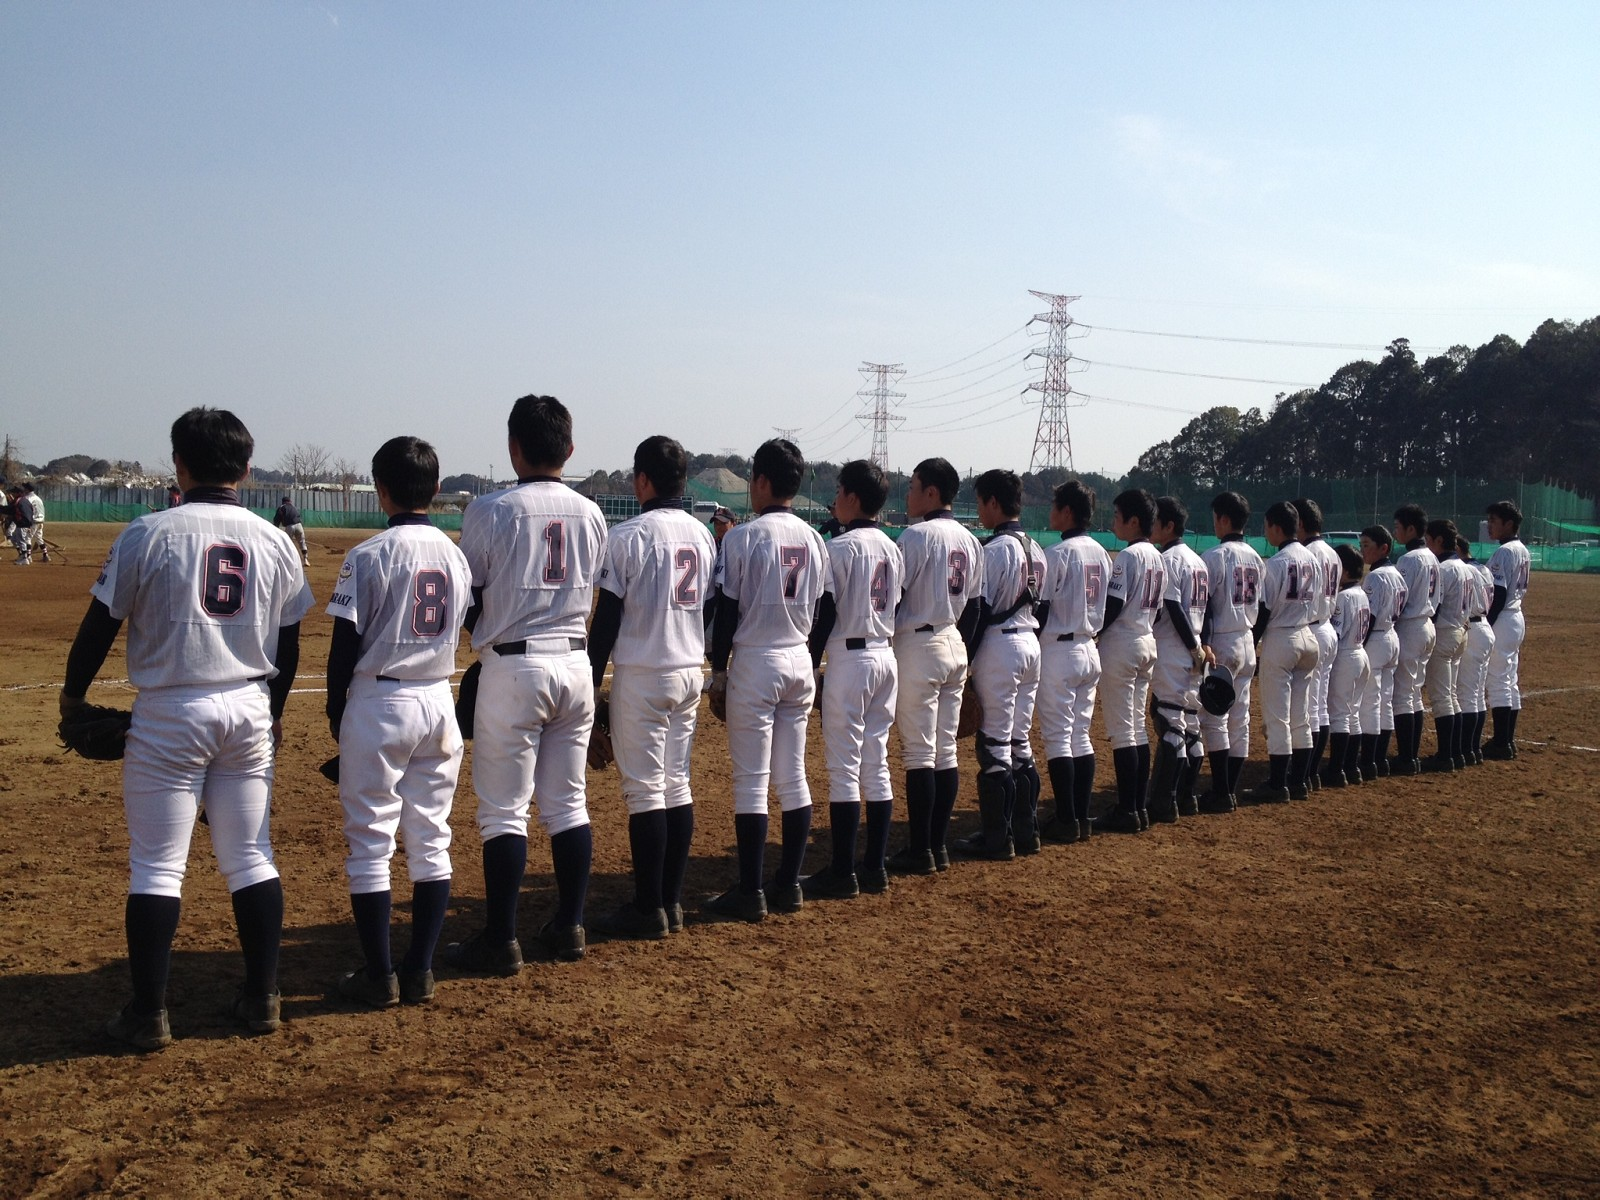 2014.03.16 東関東支部春季大会 敗者復活2回戦 香取リトルシニア戦